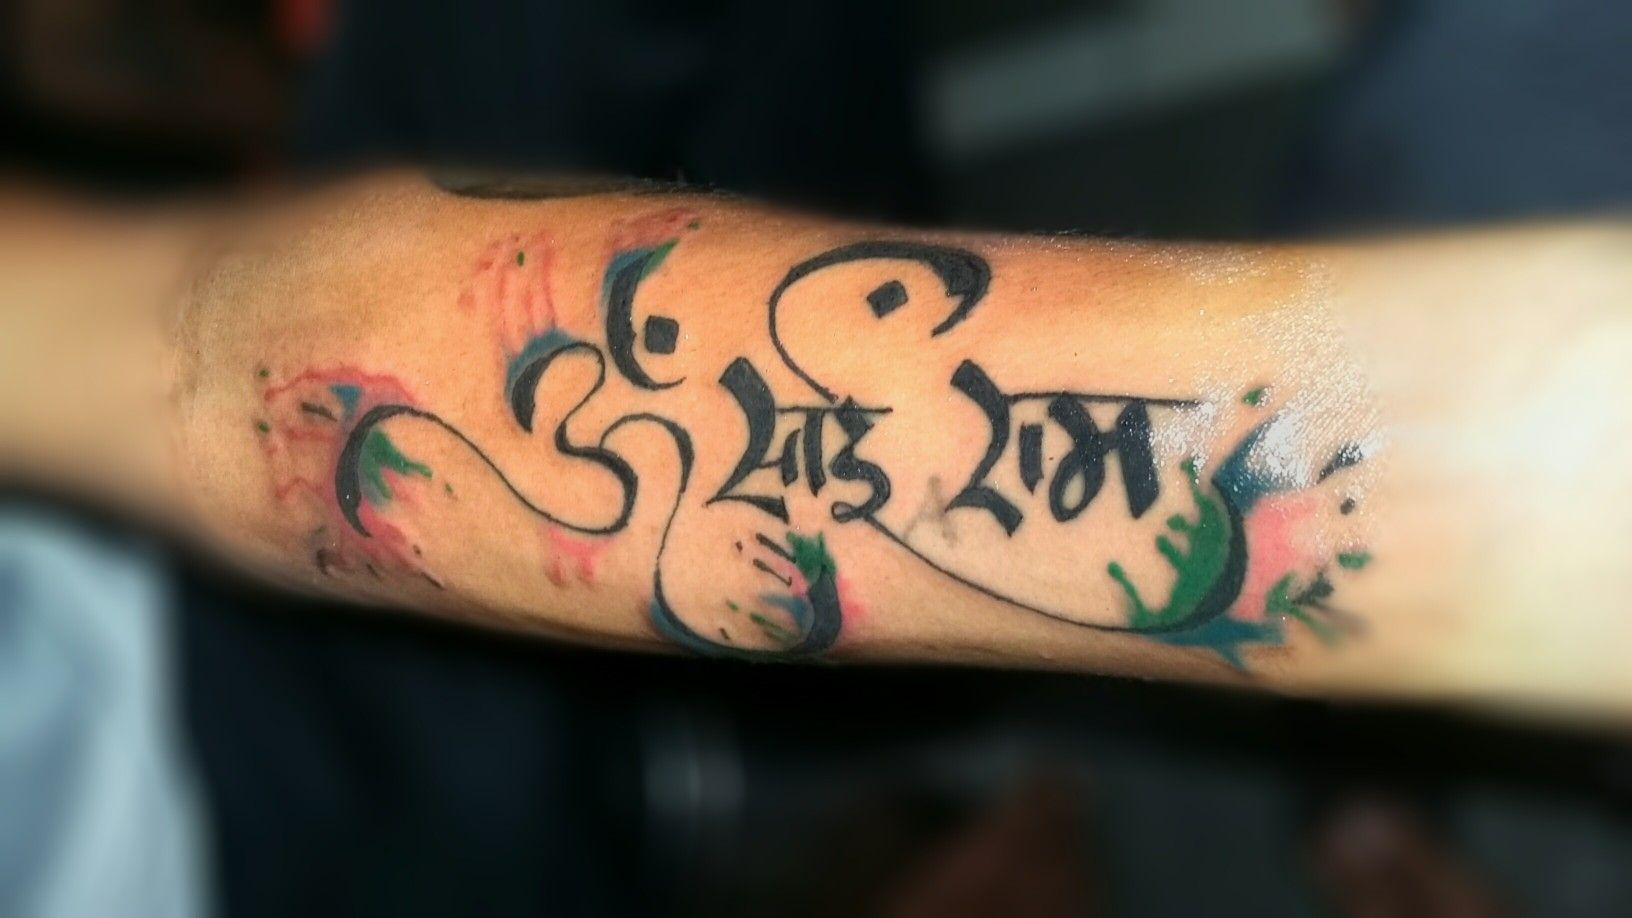 Om Sai Ram Tattoo Artist Kushal Bane Mobile 8286726646 8097464194 Ram Tattoo Tattoos Tattoo Artists